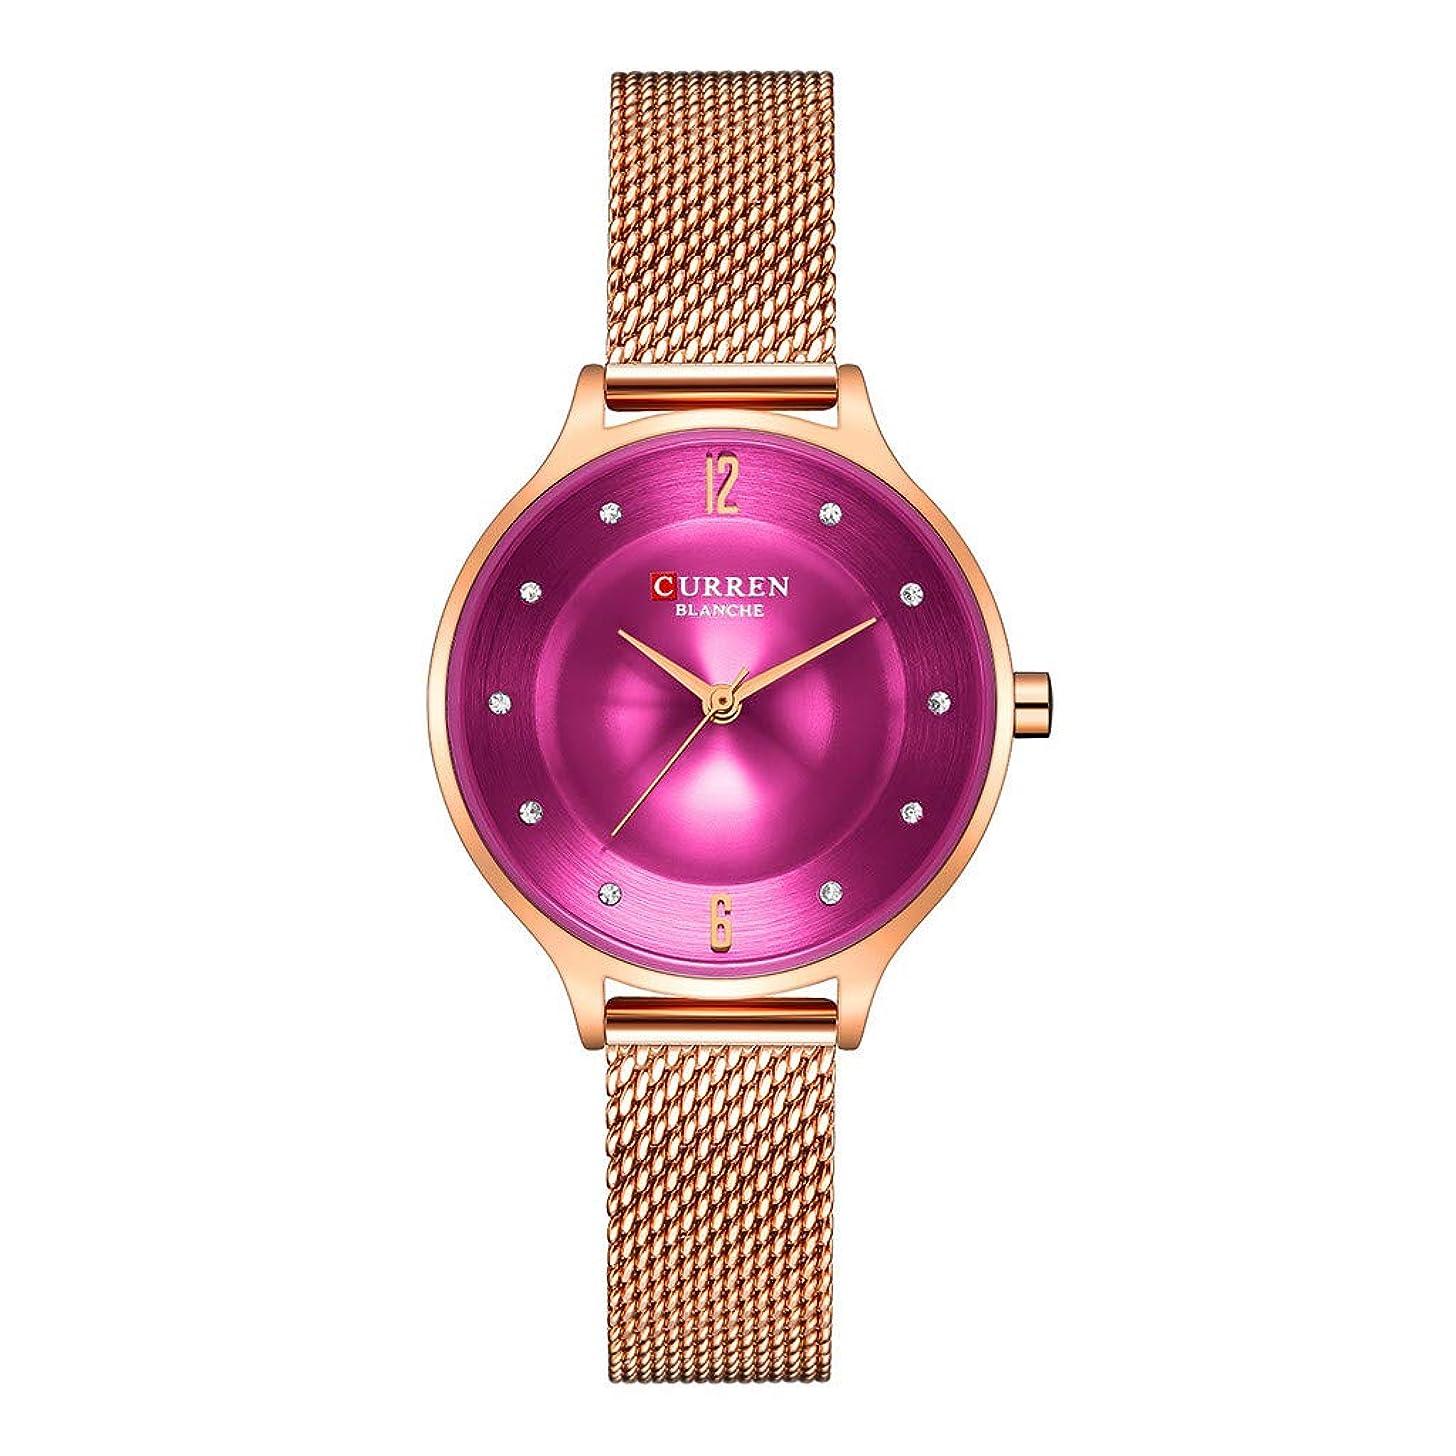 LUCAMORE Creative Simplicity Women Watch Mesh Band Elegant Women Waterproof Watches Ladies Business Wristwatch